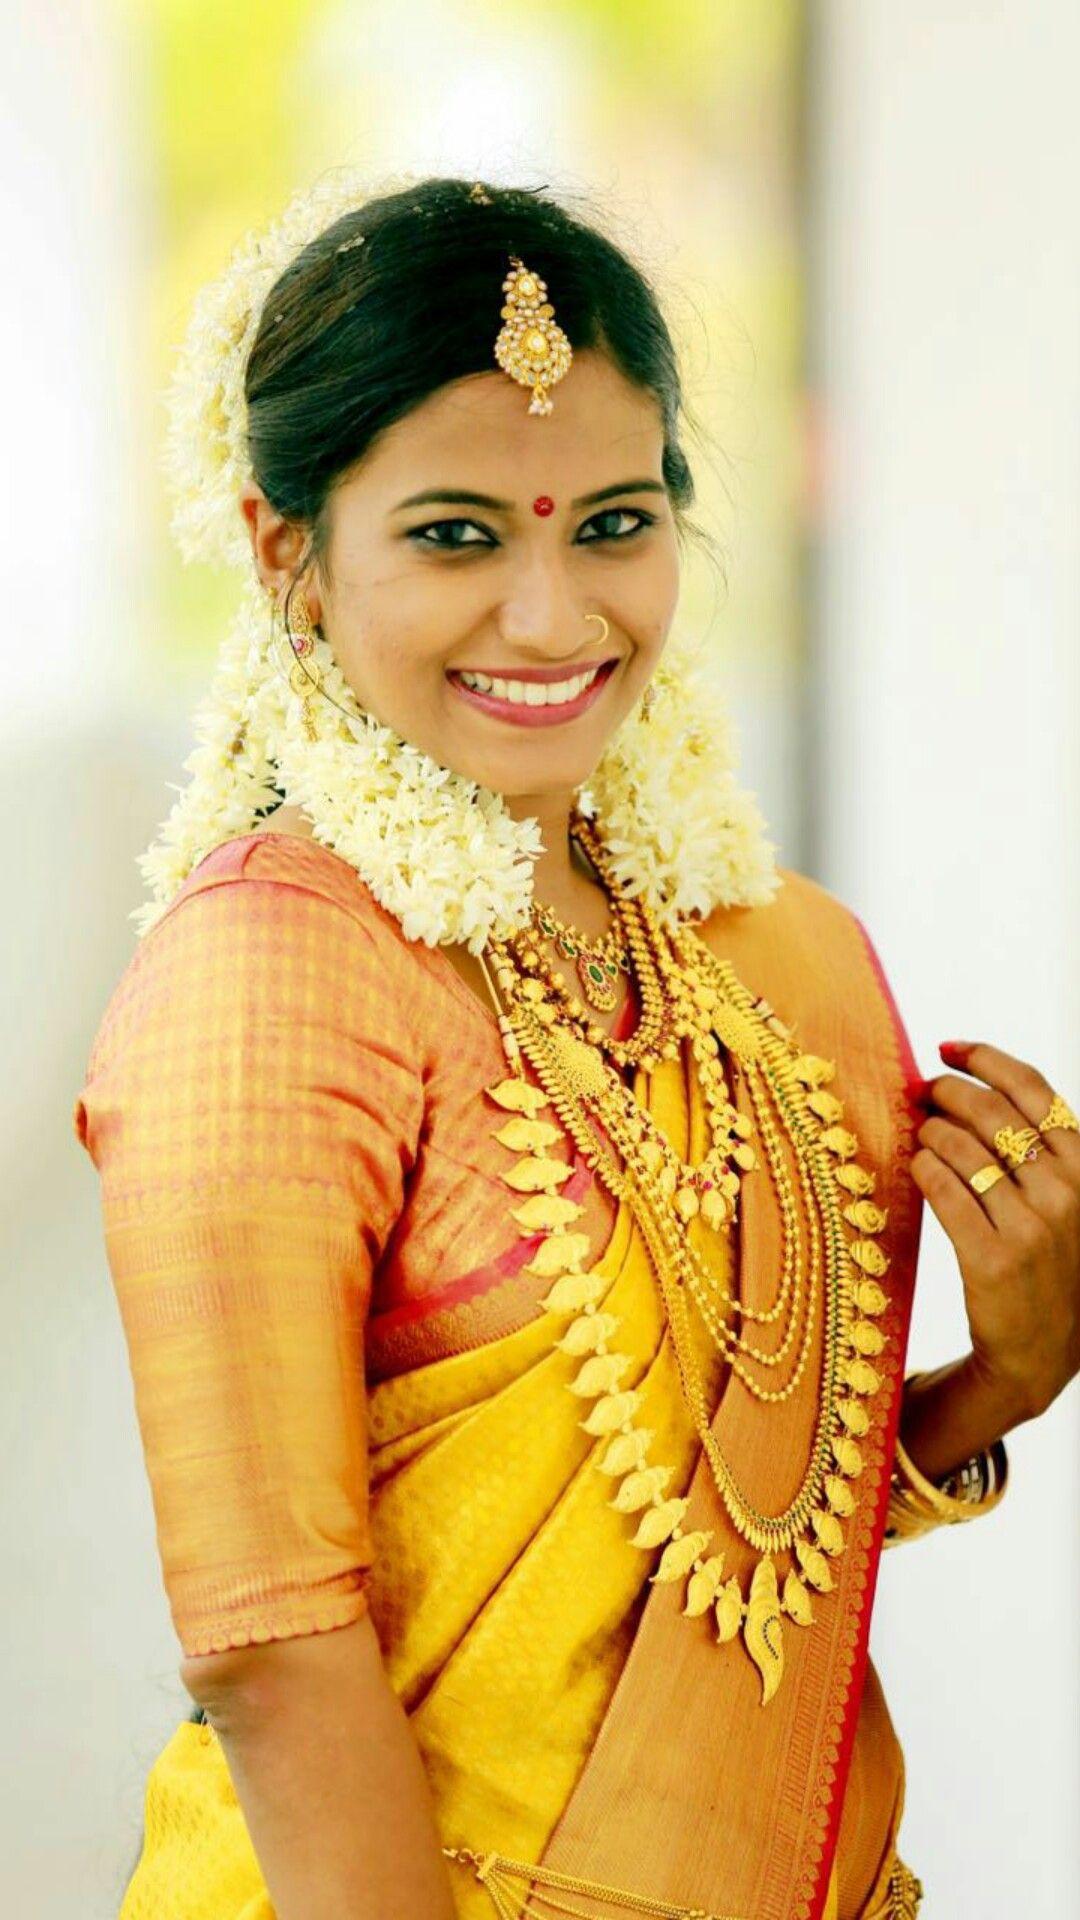 The beautiful bride | classy indian jewel | Pinterest | Saree ...